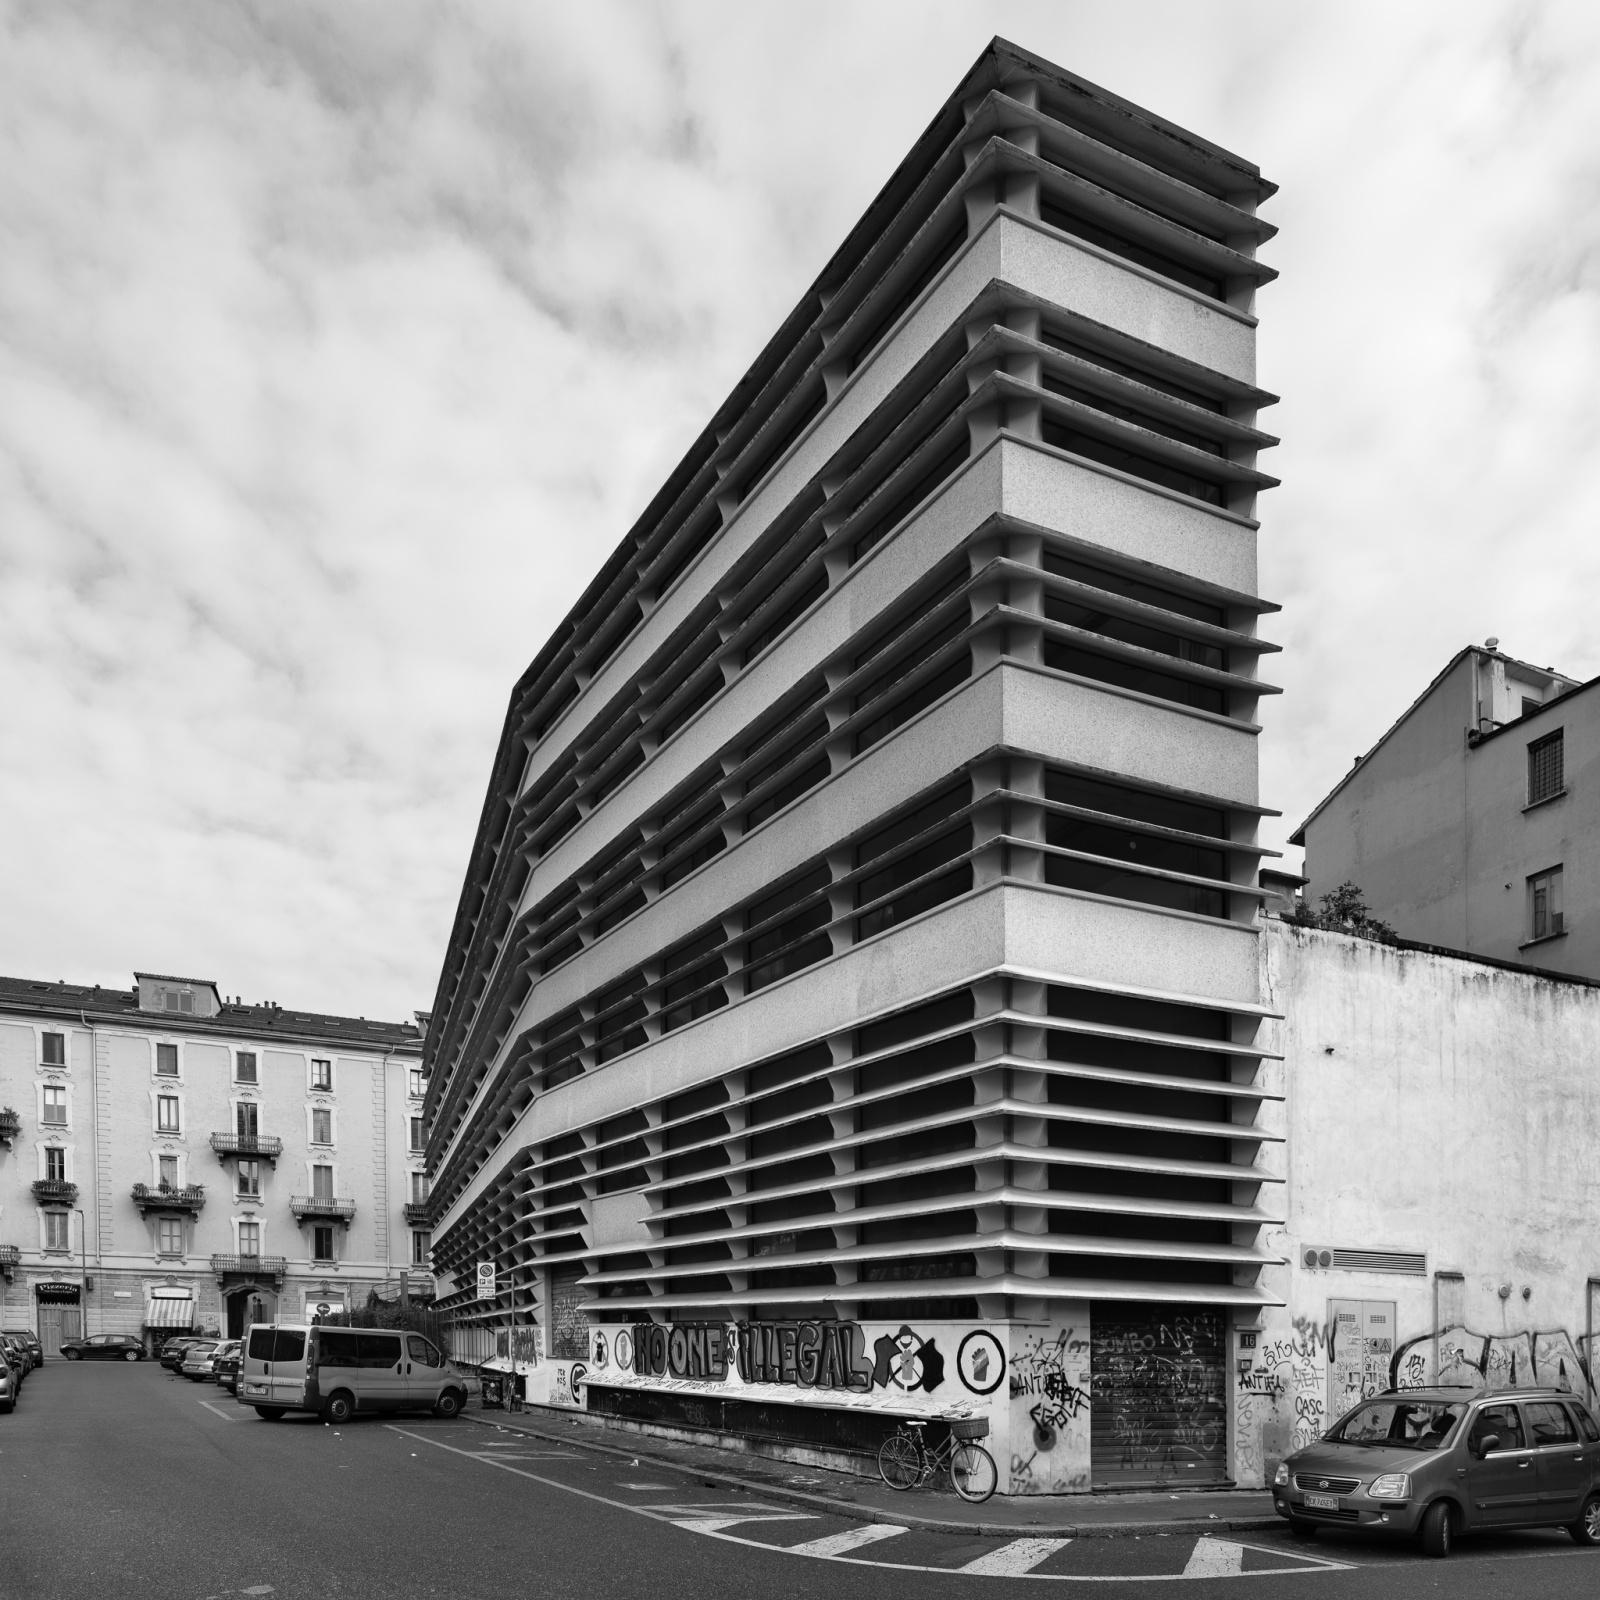 Arrigo Arrighetti - Archivio Civico, 2018